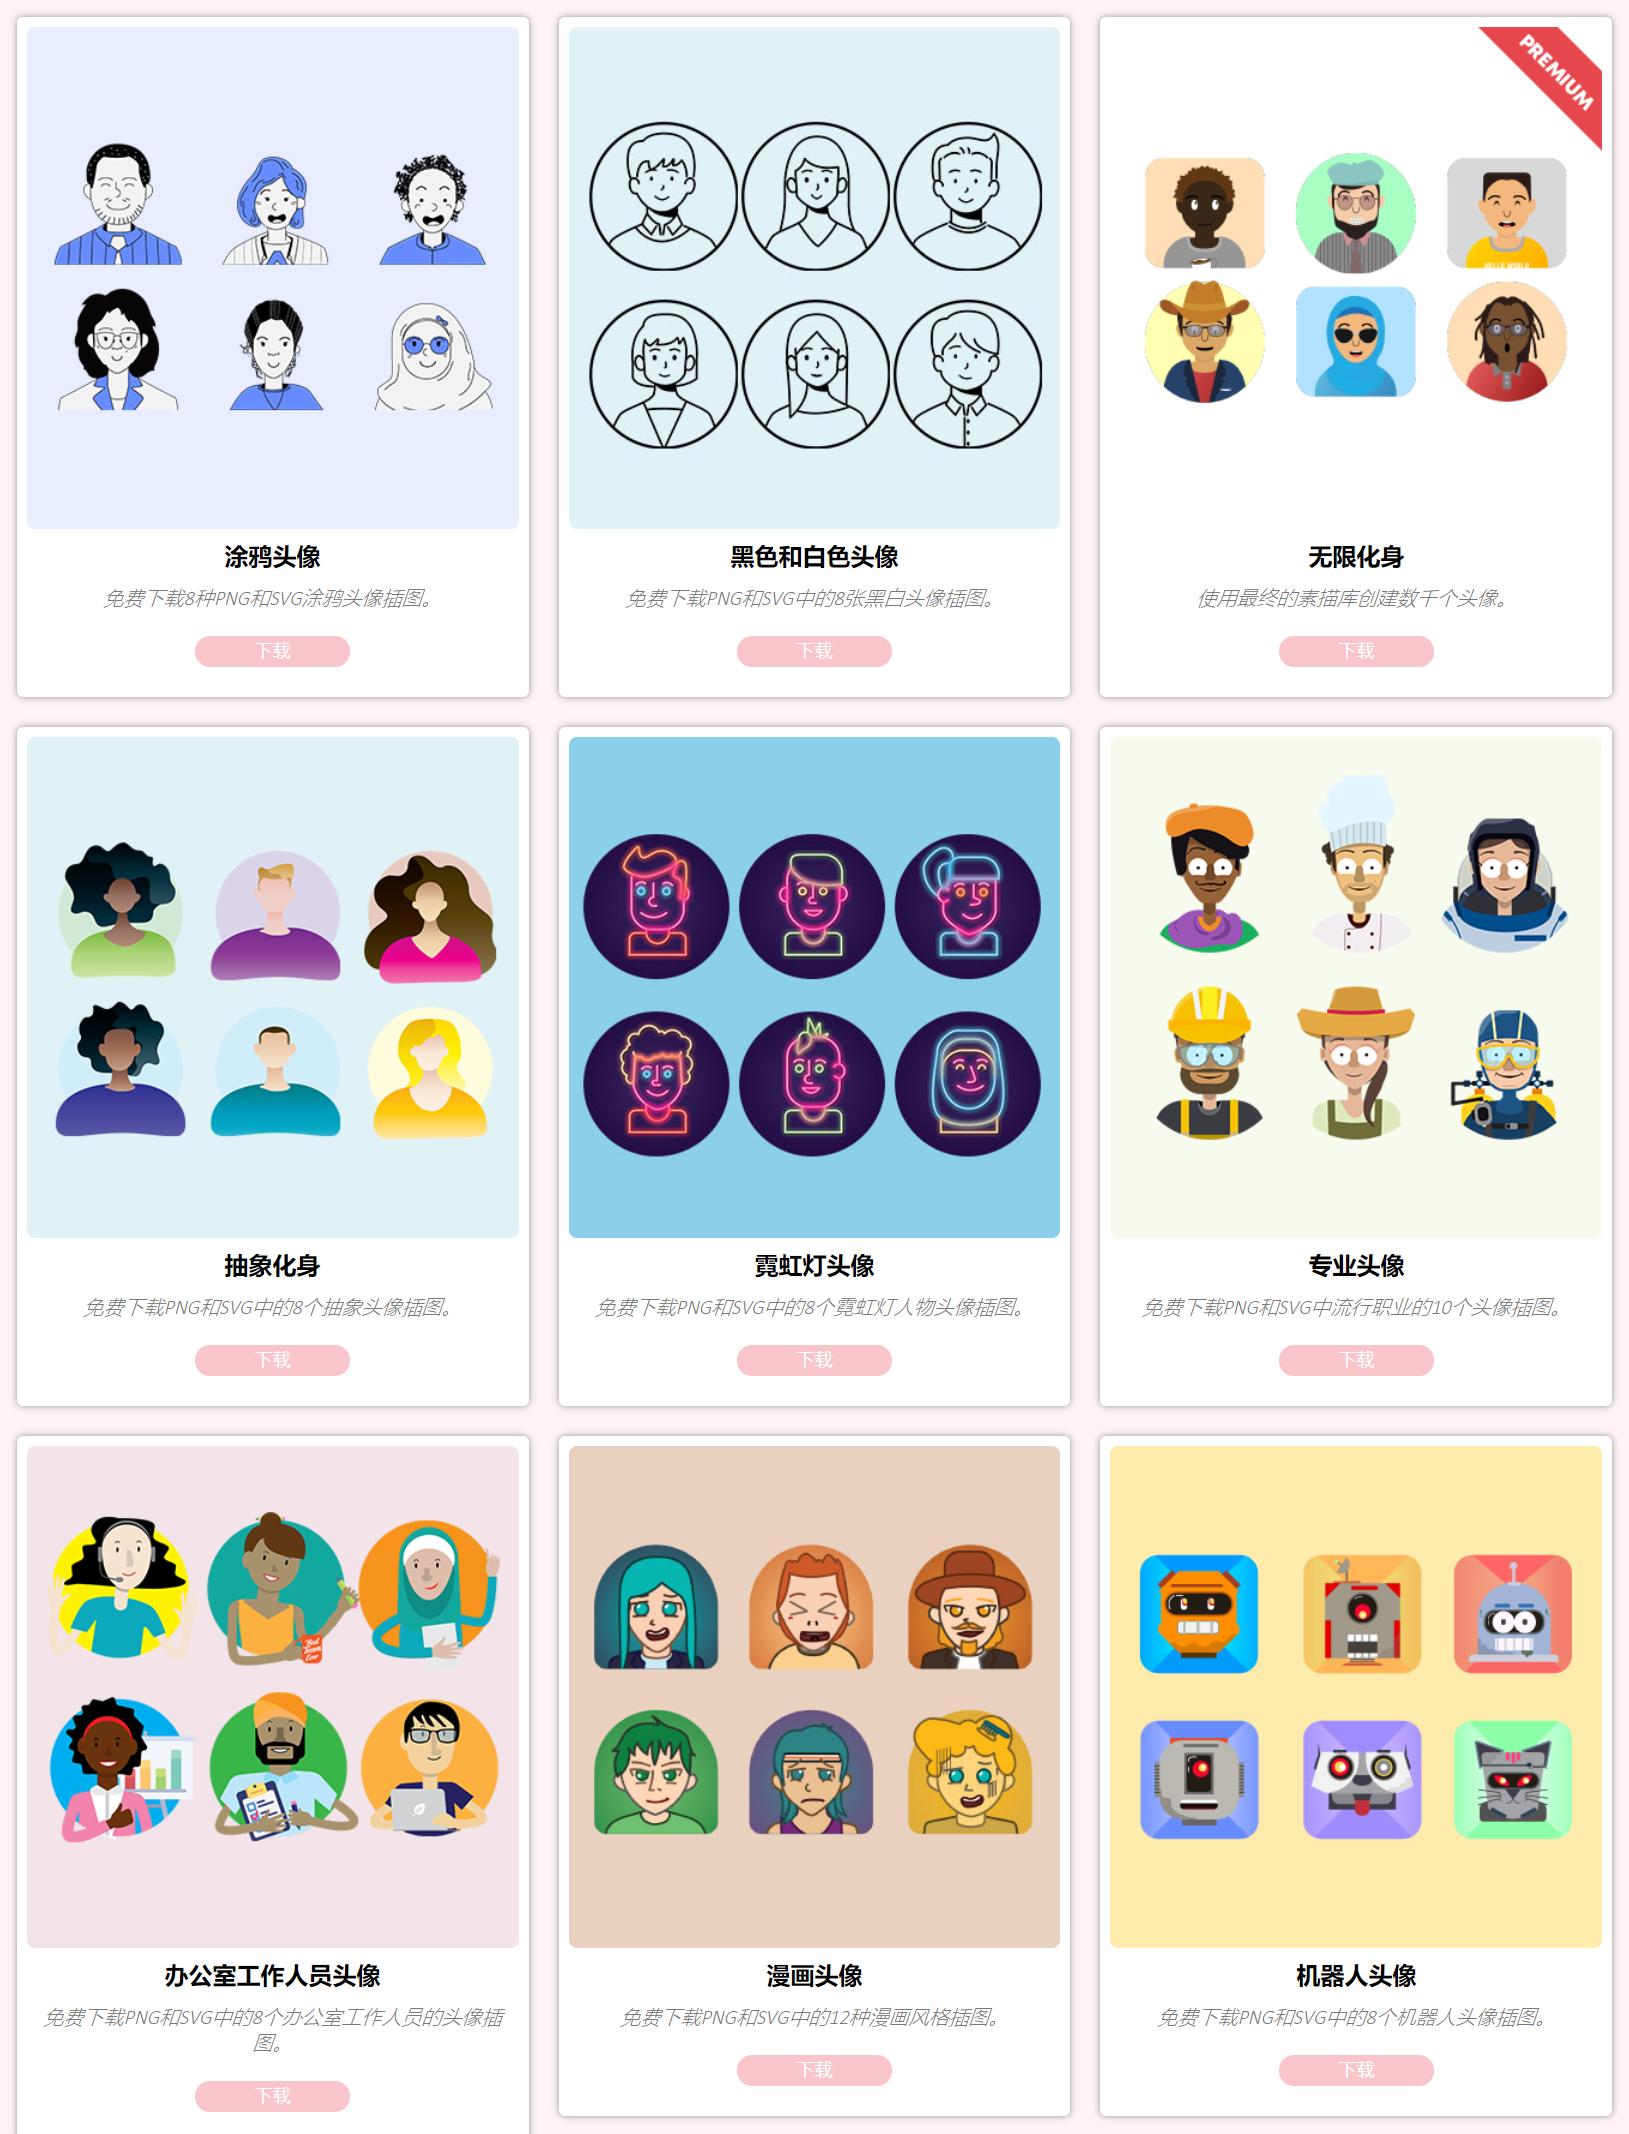 The Ultimate Avatar Library – 提供上百张免费的可爱插图头像素材网站